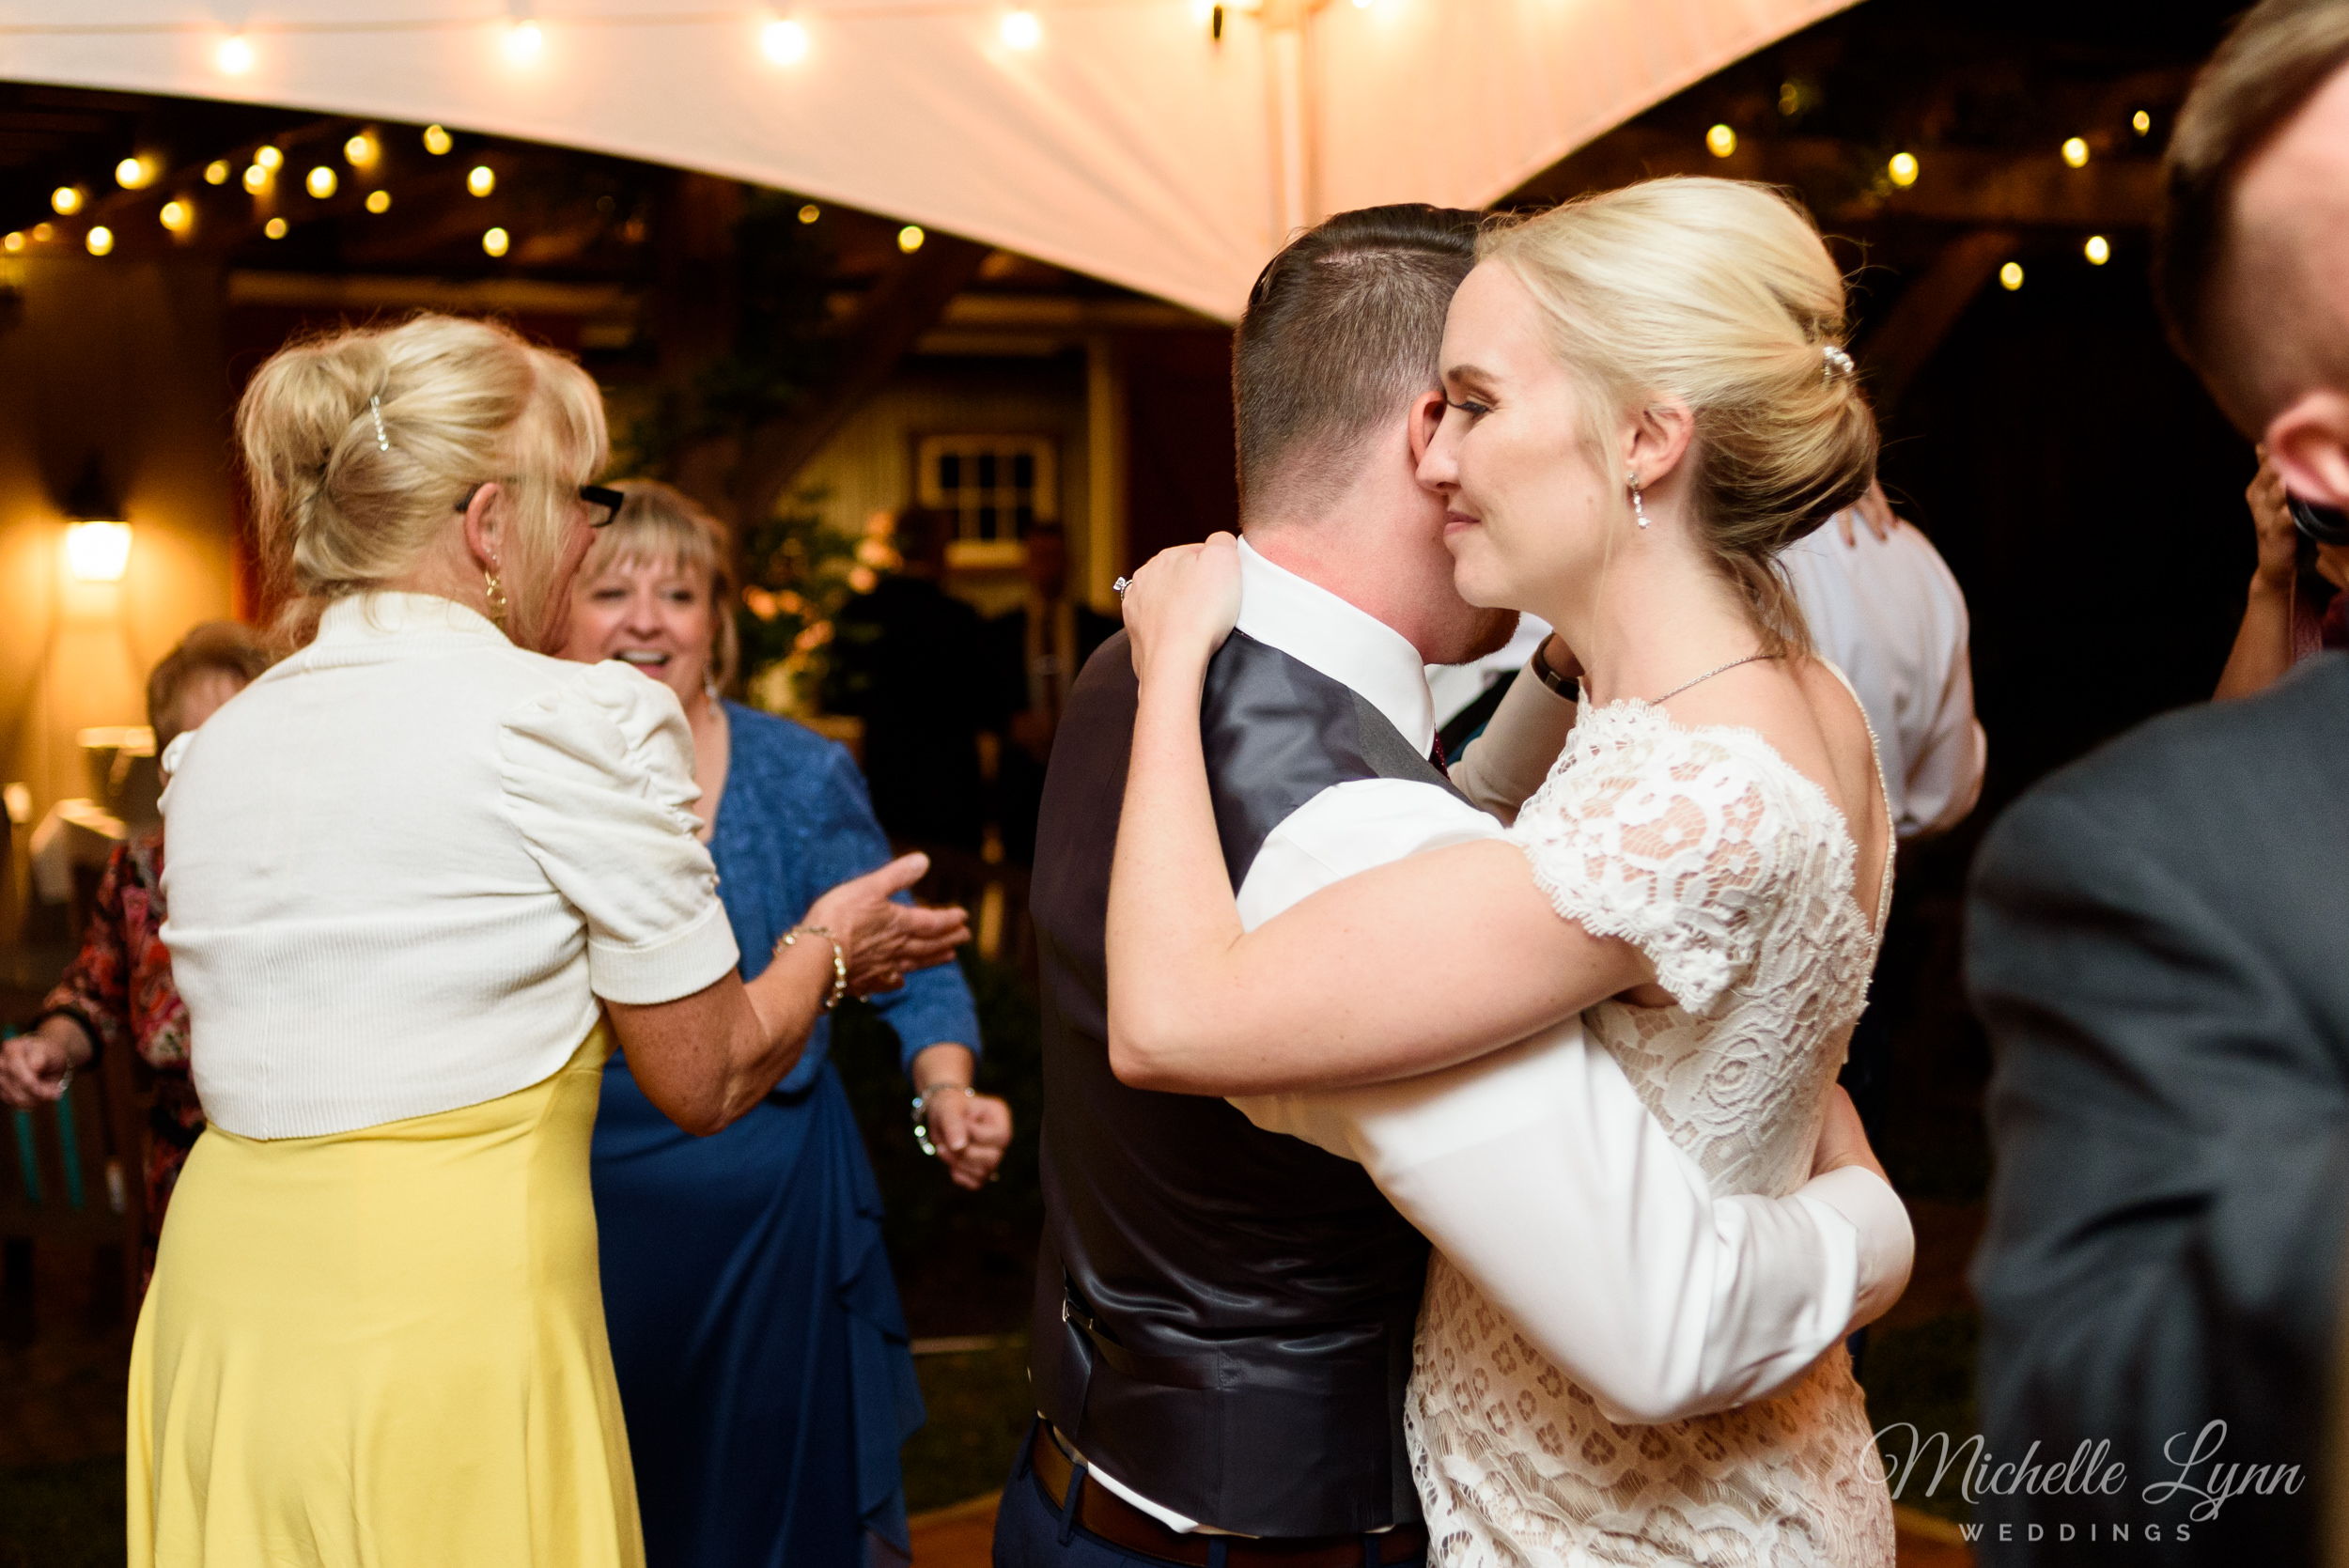 mlw-lumberville-general-store-new-hope-wedding-photographer-79.jpg